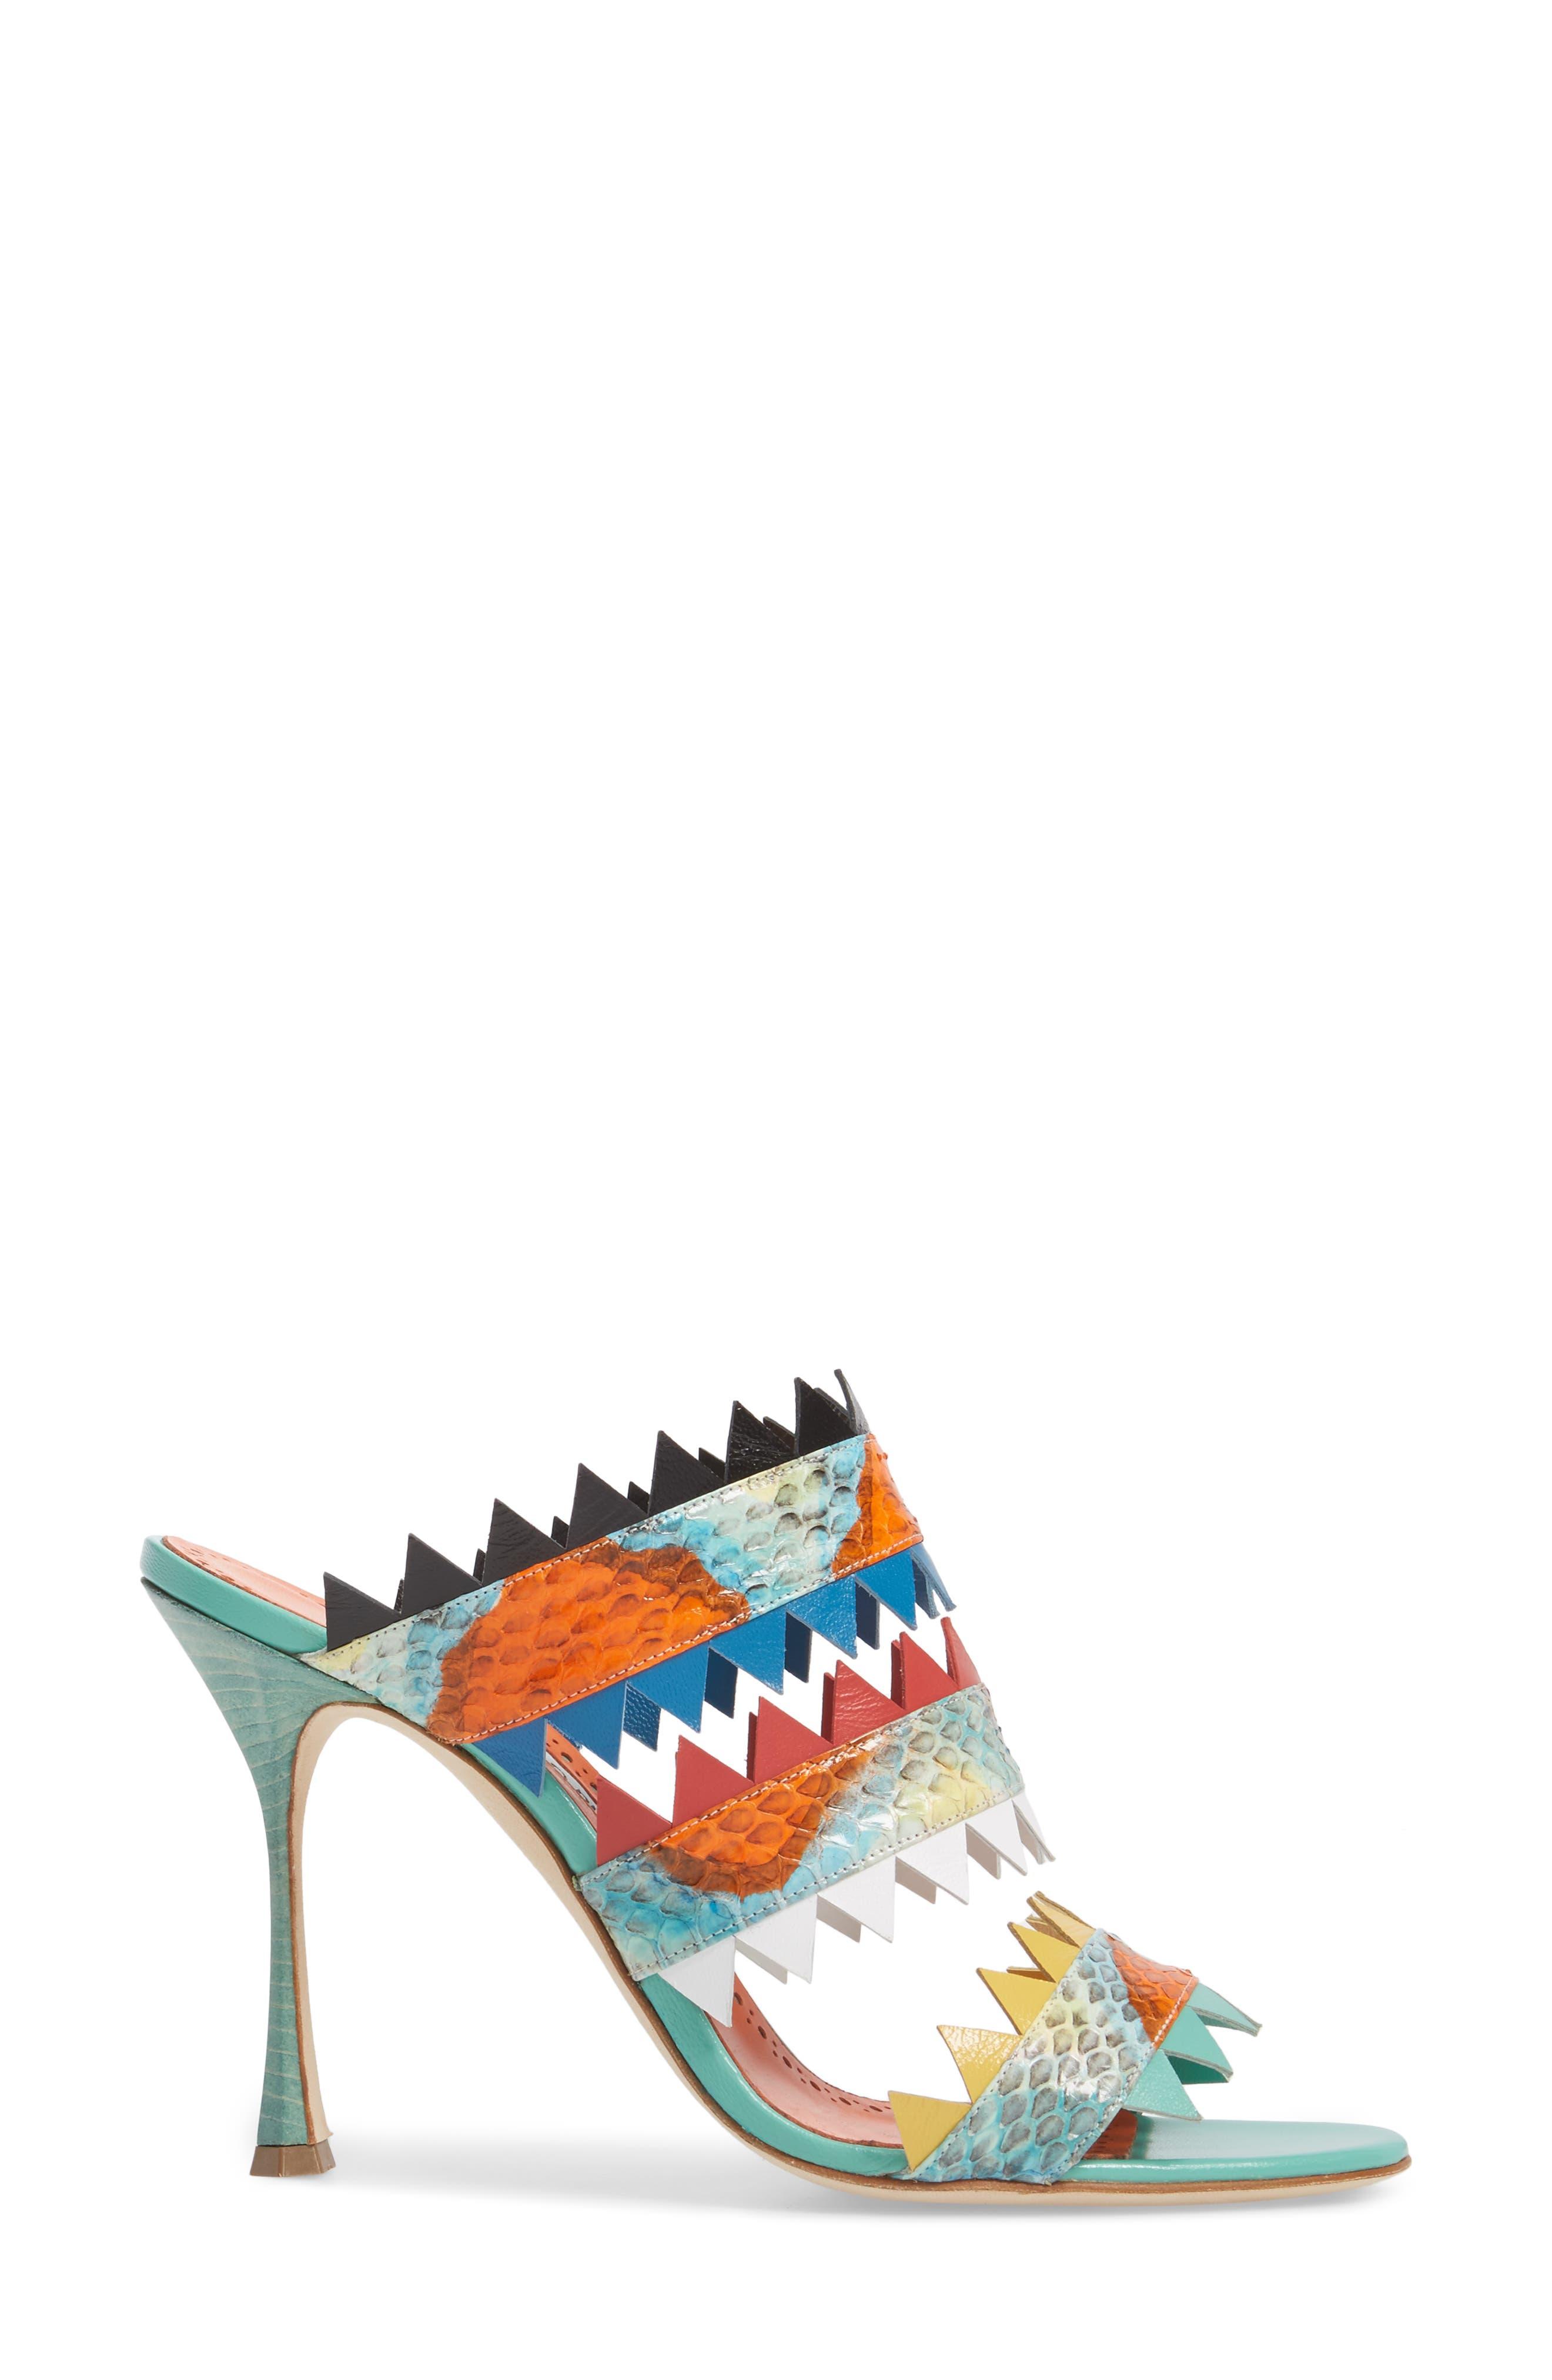 Arpege Mule Sandal,                             Alternate thumbnail 3, color,                             Watersnake Multi